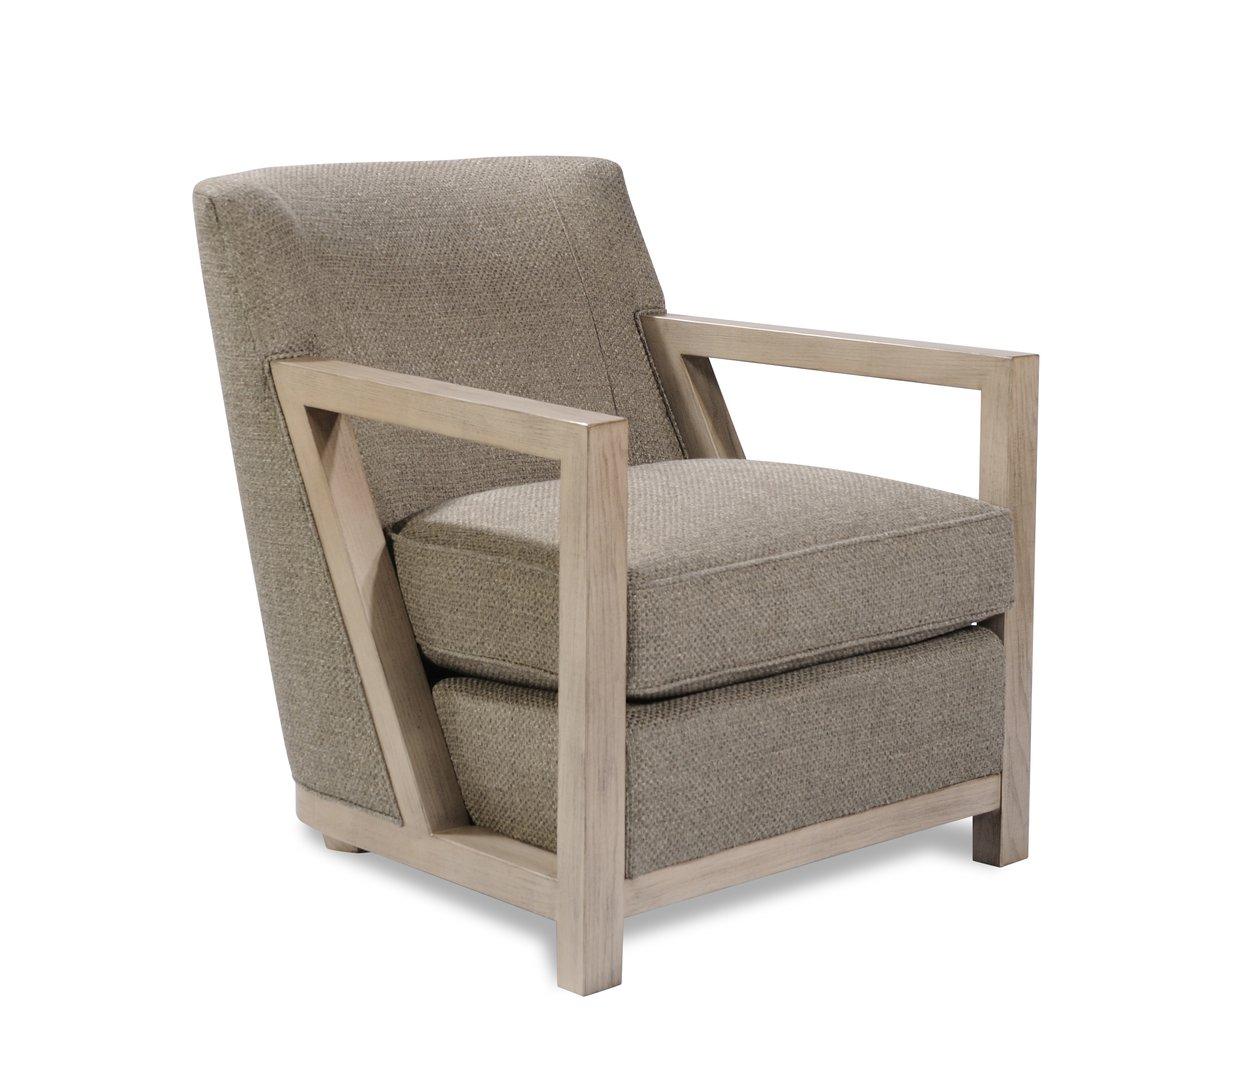 Menlo Chair Image